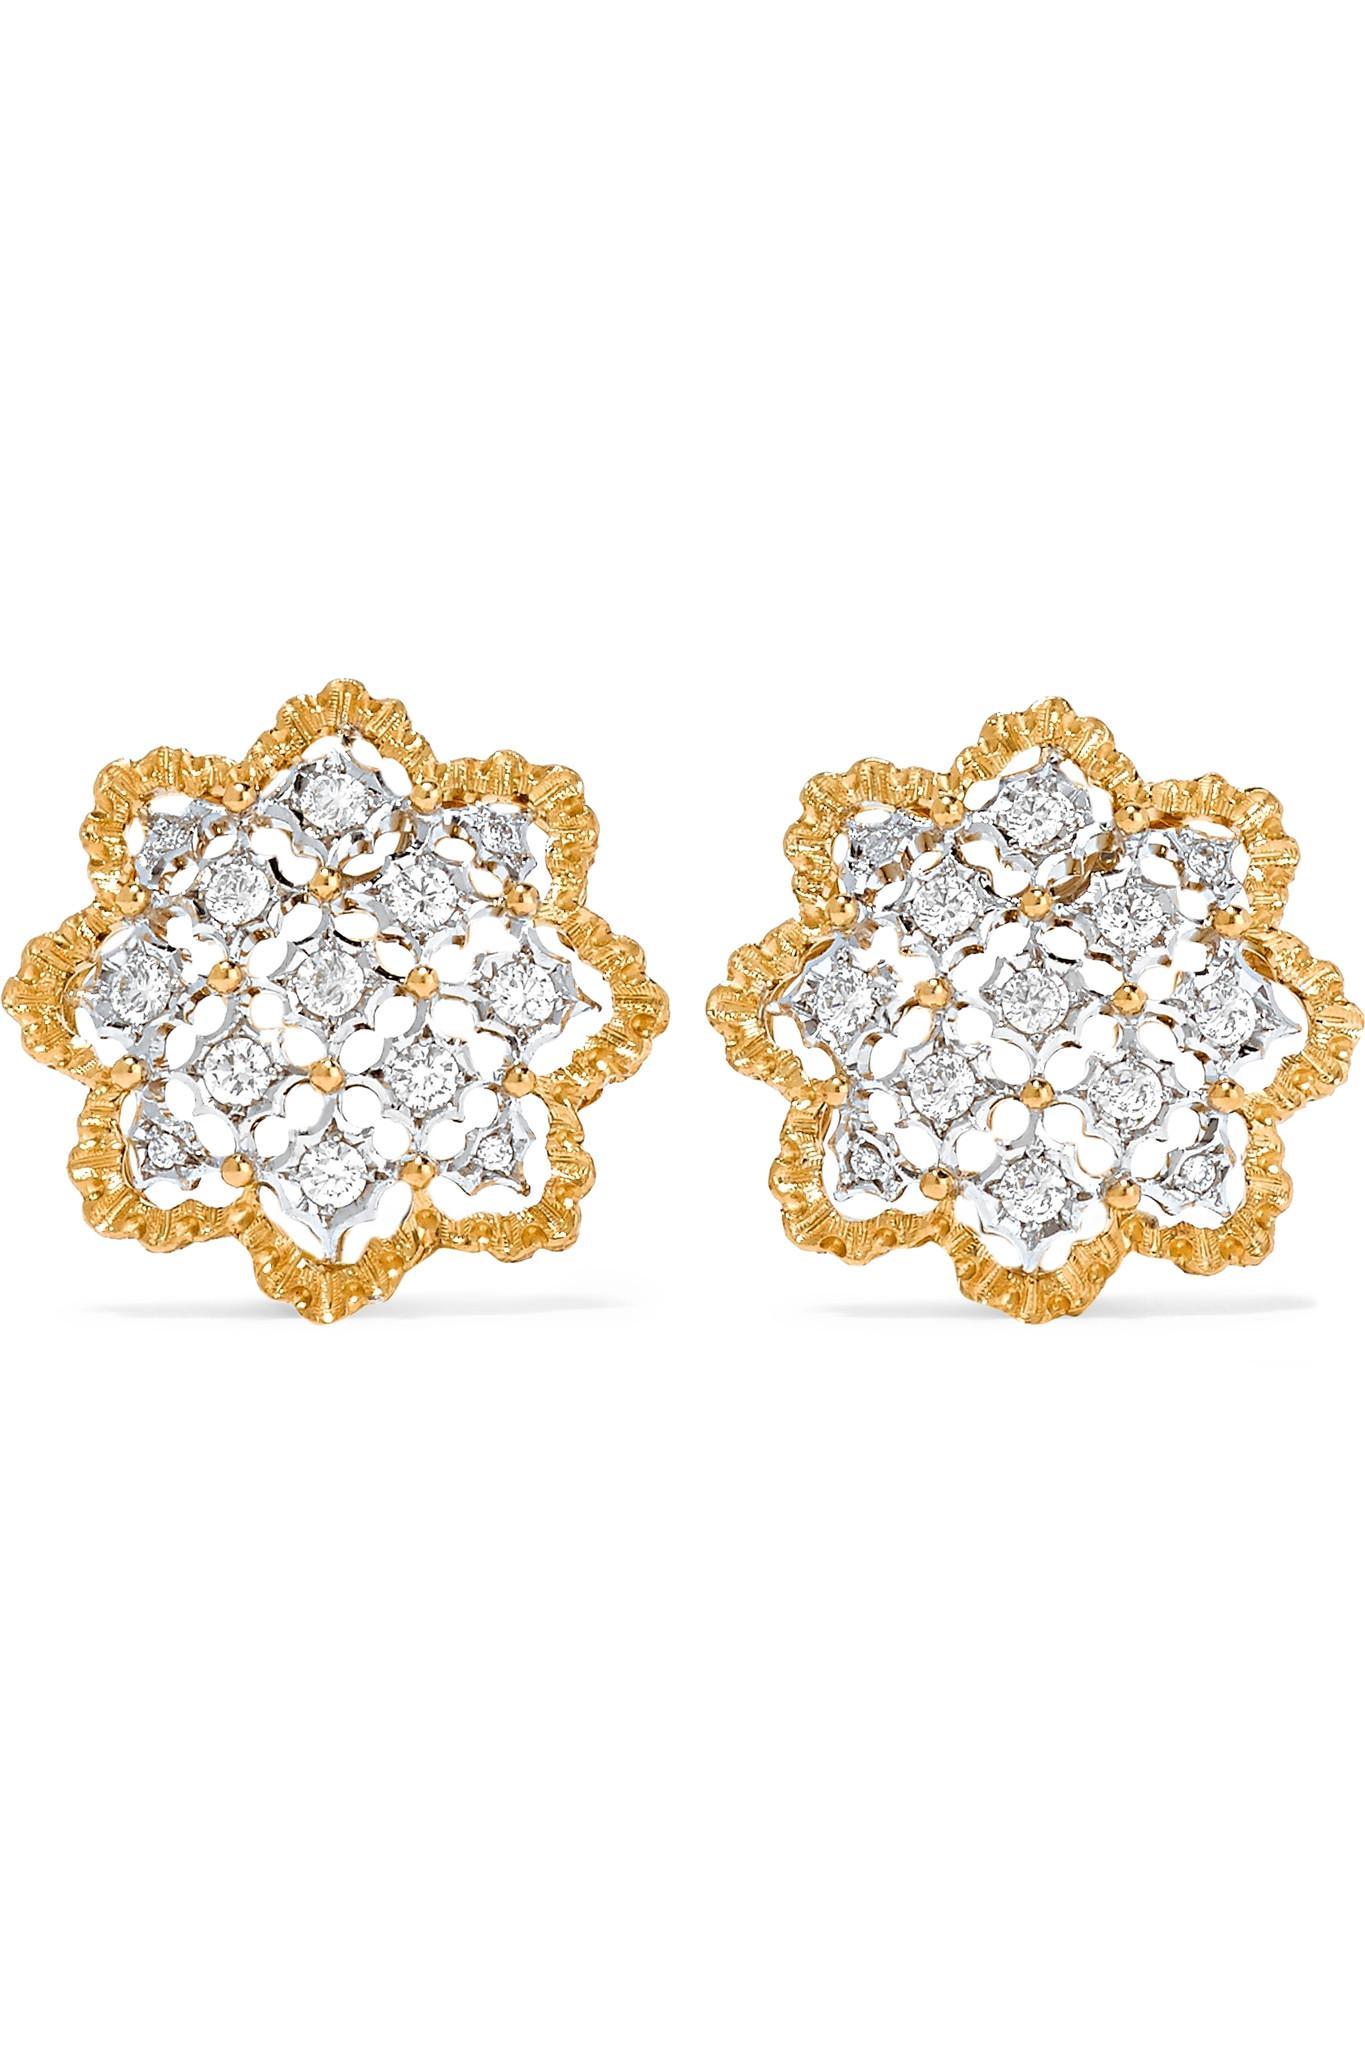 Buccellati Rombi 18-karat Yellow And White Gold Diamond Earrings gdmLzJ1u